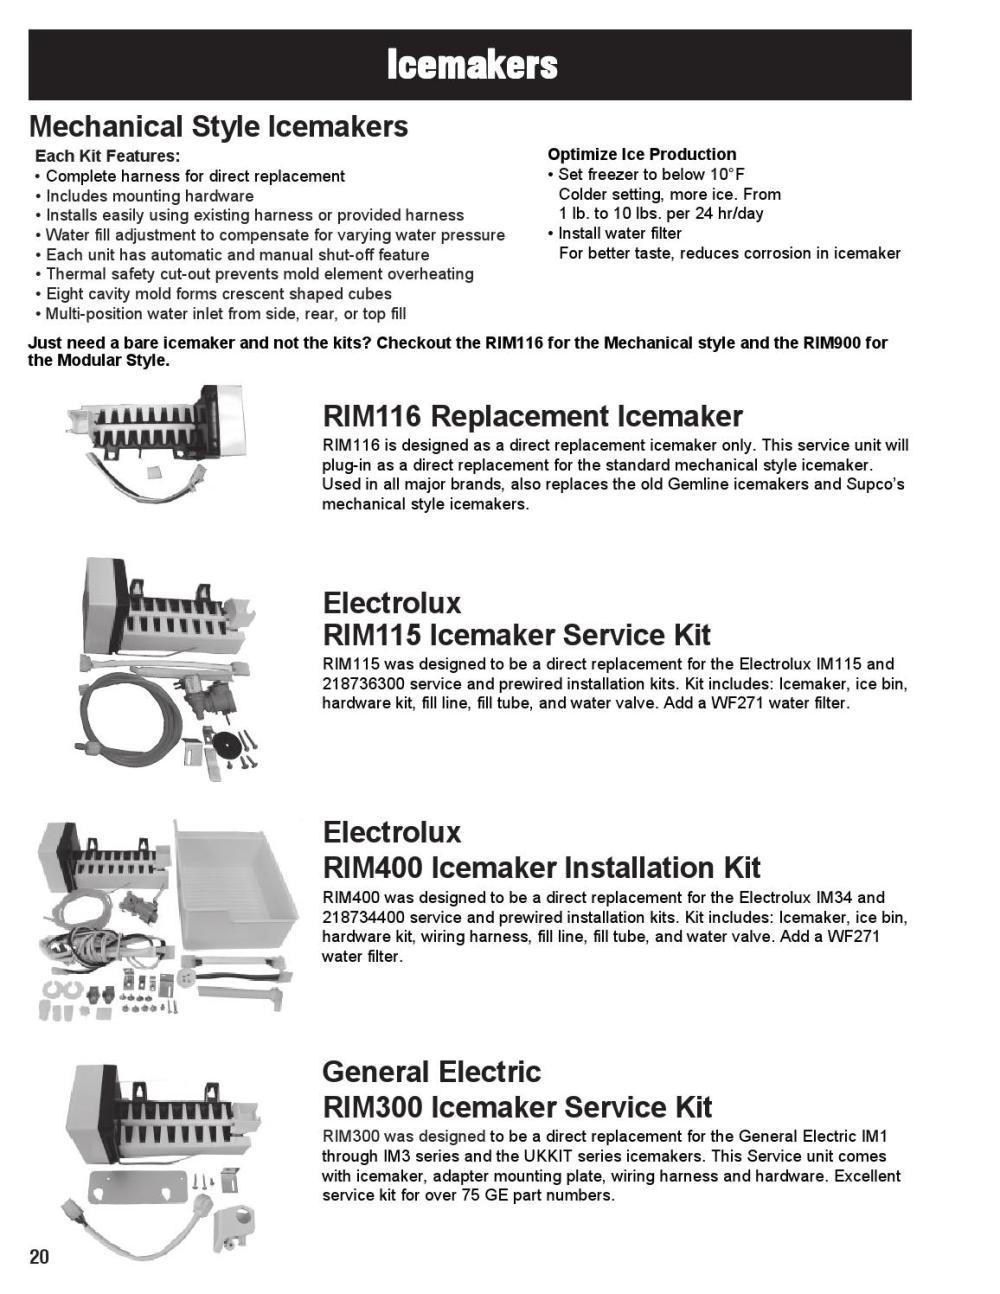 medium resolution of supco rco810 wiring diagram 27 wiring diagram images wiring diagrams mifinder co supco spp6 wiring diagram supco rco810 wiring diagram